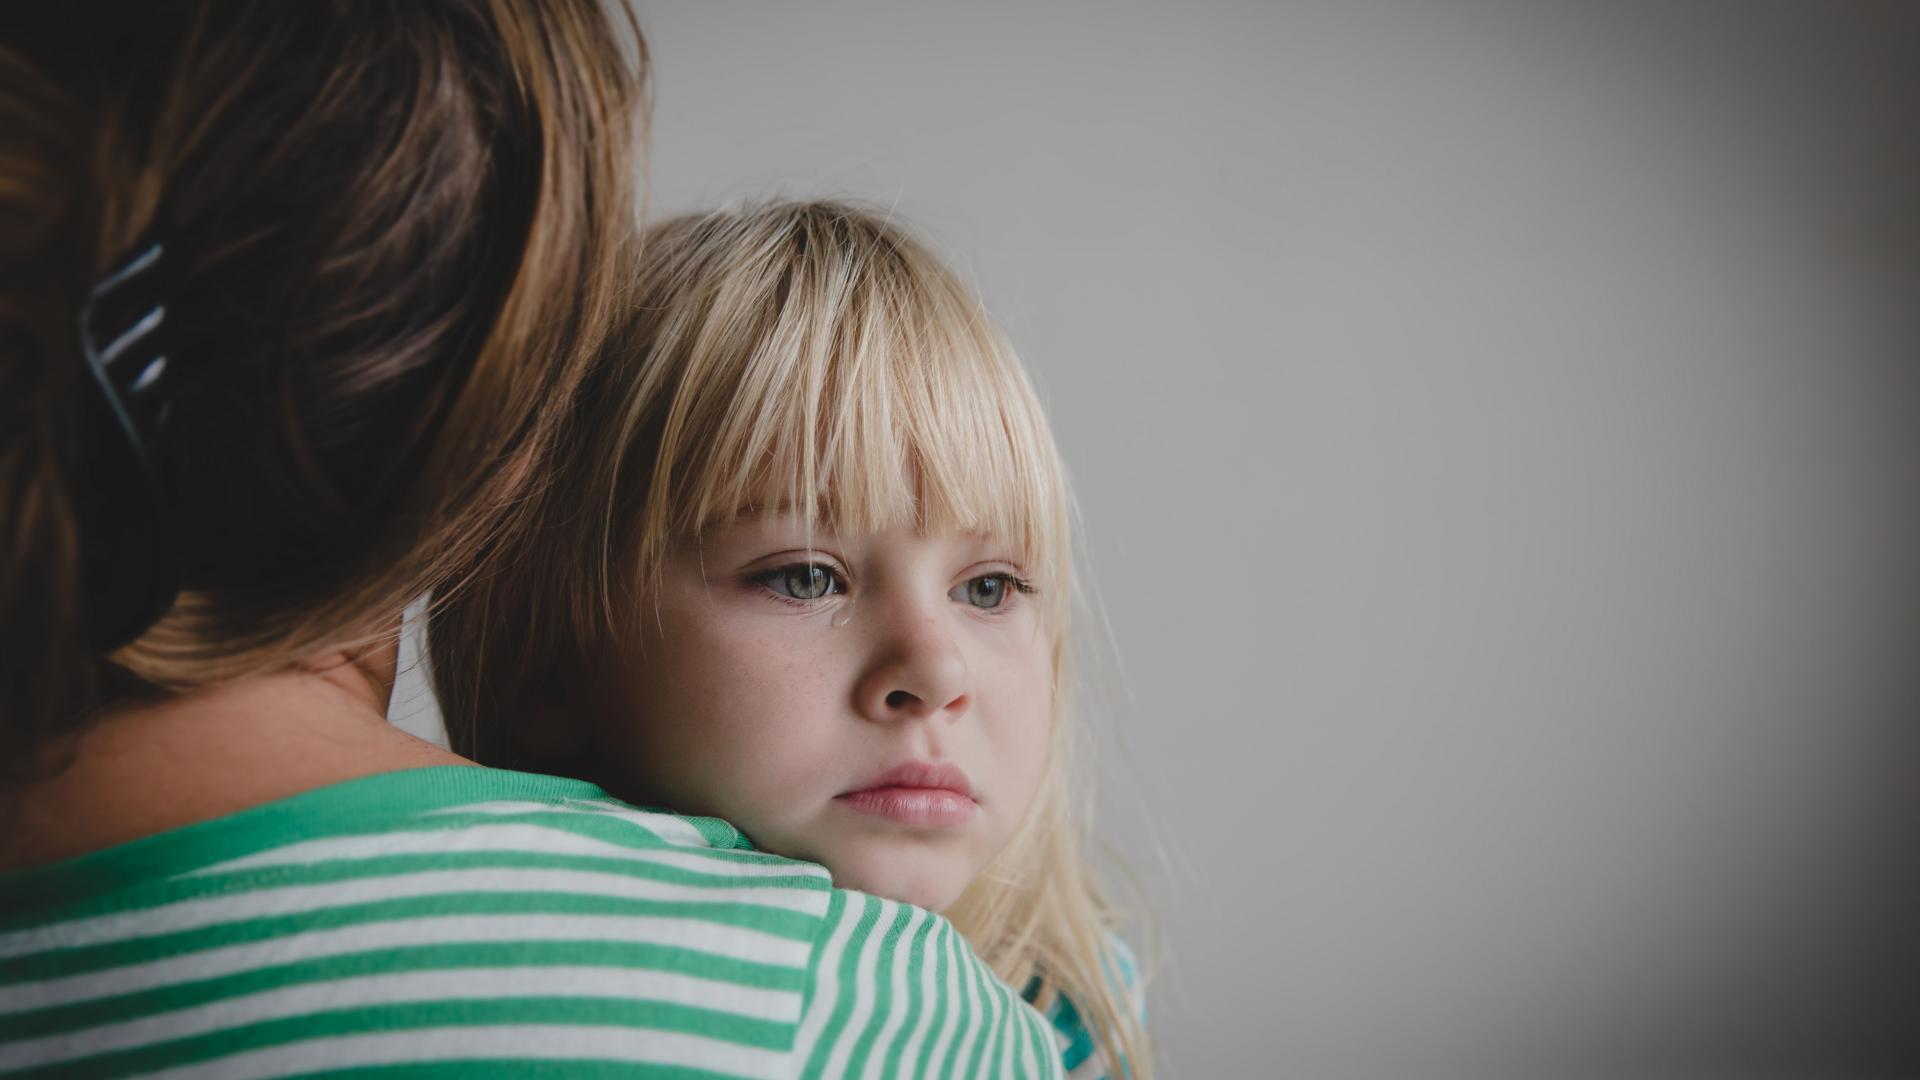 Mutter Kind weint